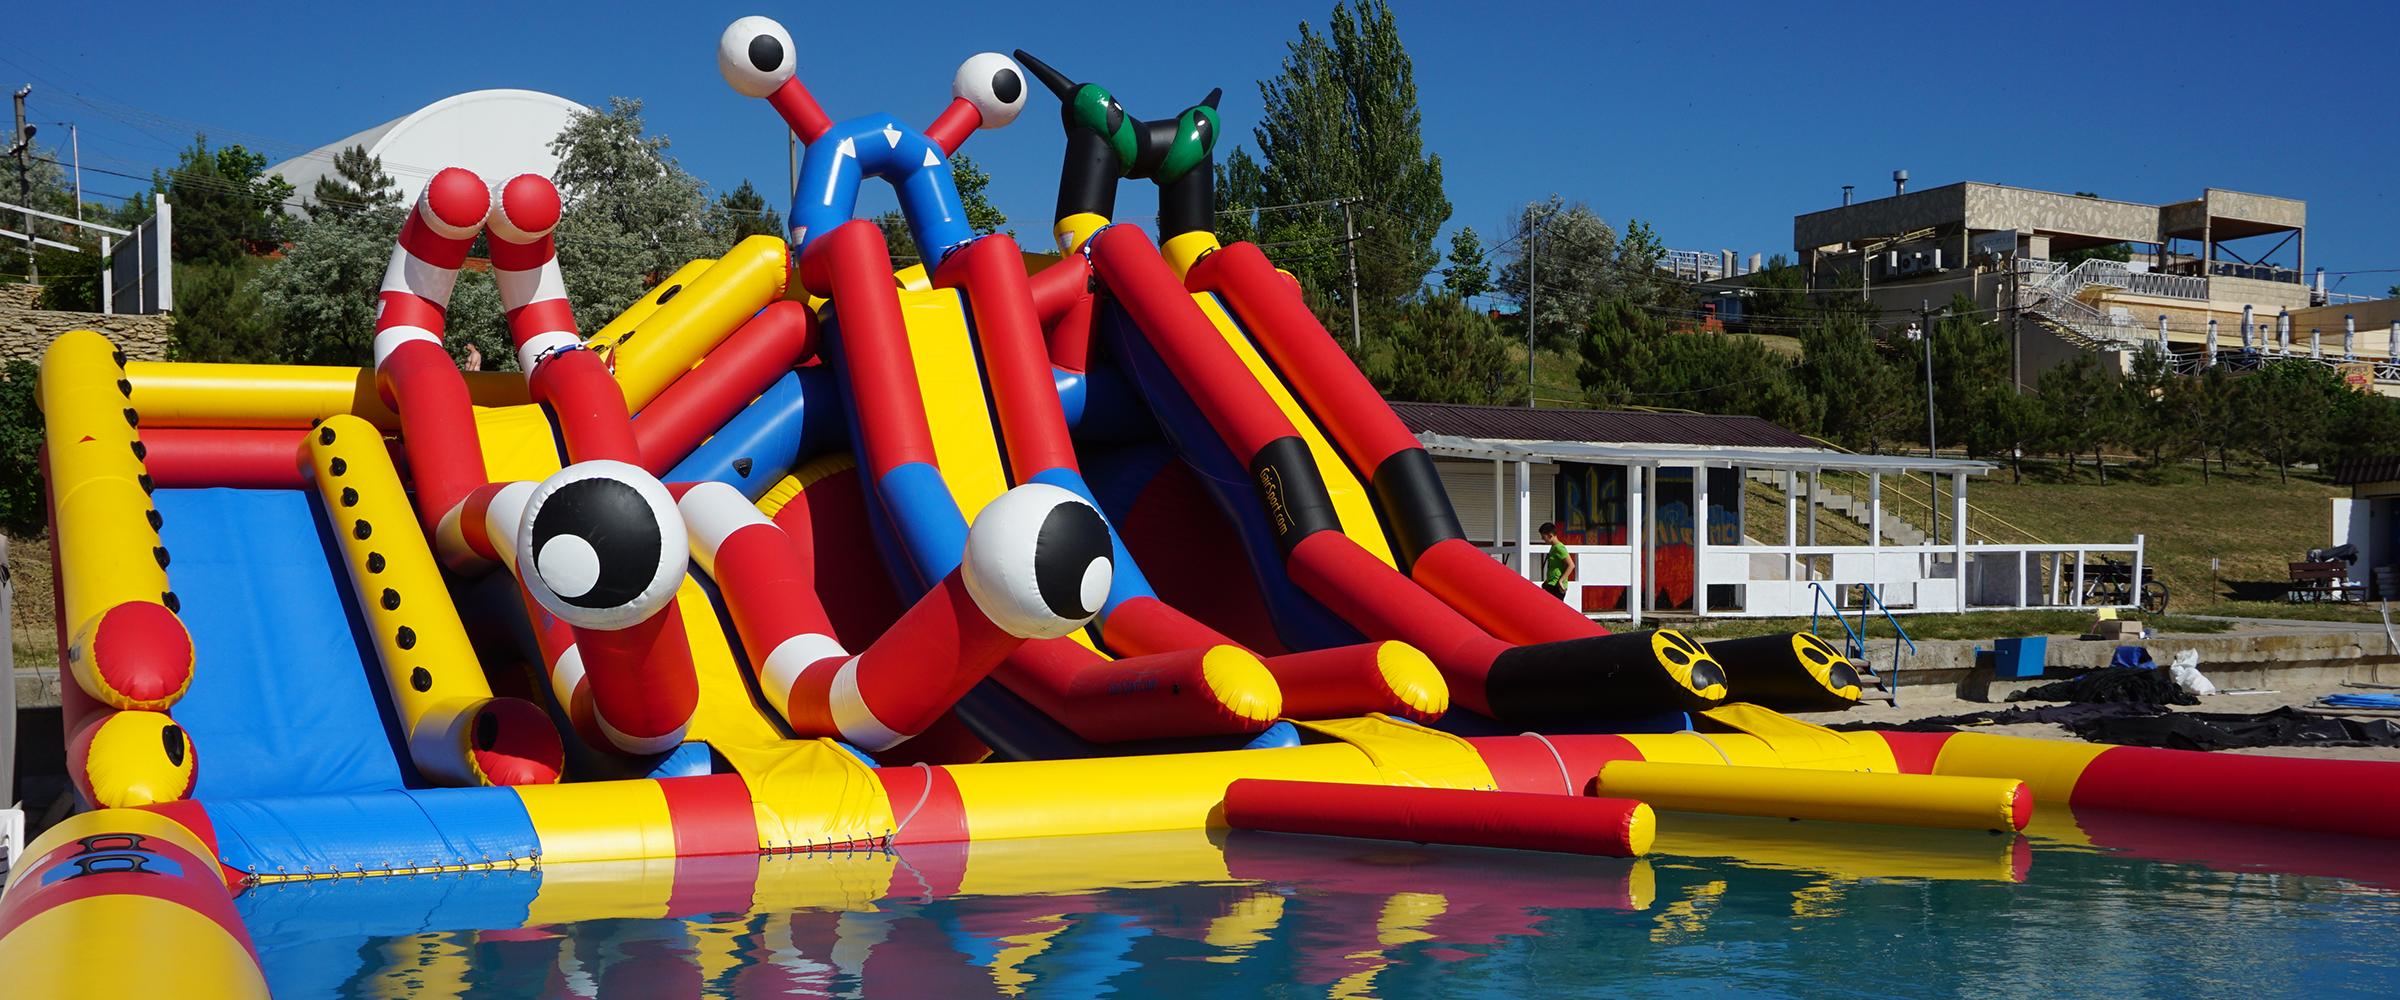 Надувной аквапарк с тремя горками и надувным пандусом Inflatable water park with inflatable ramp GAIRSPORT 4